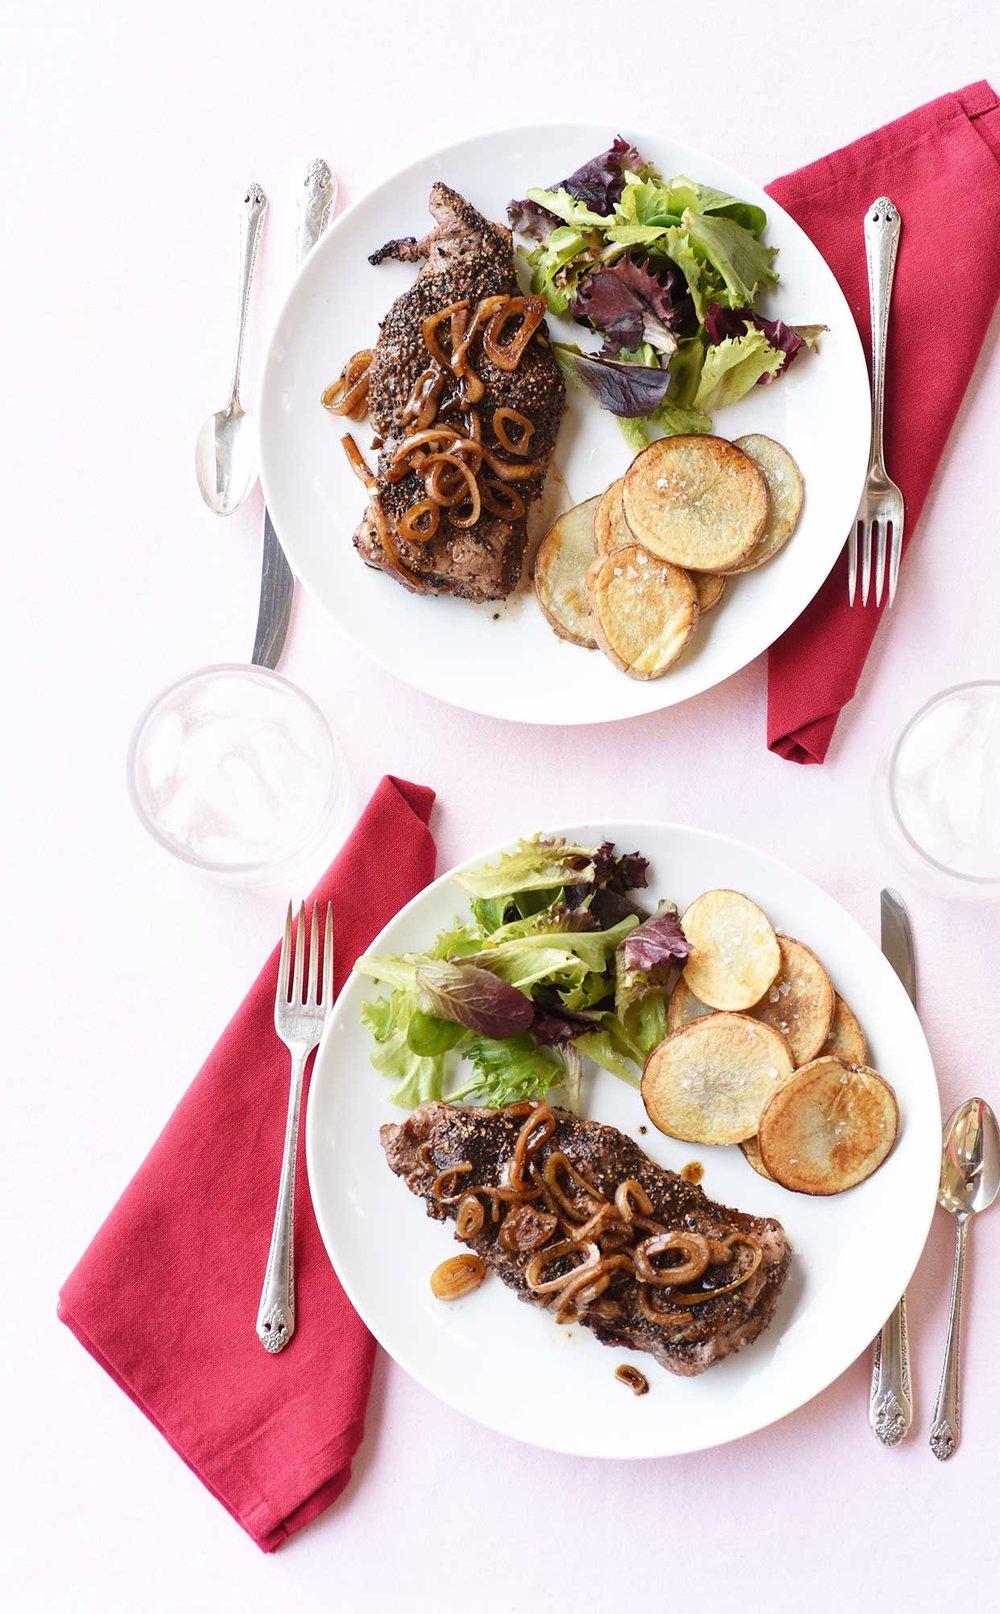 Ali Hedin's Steak au Poivre